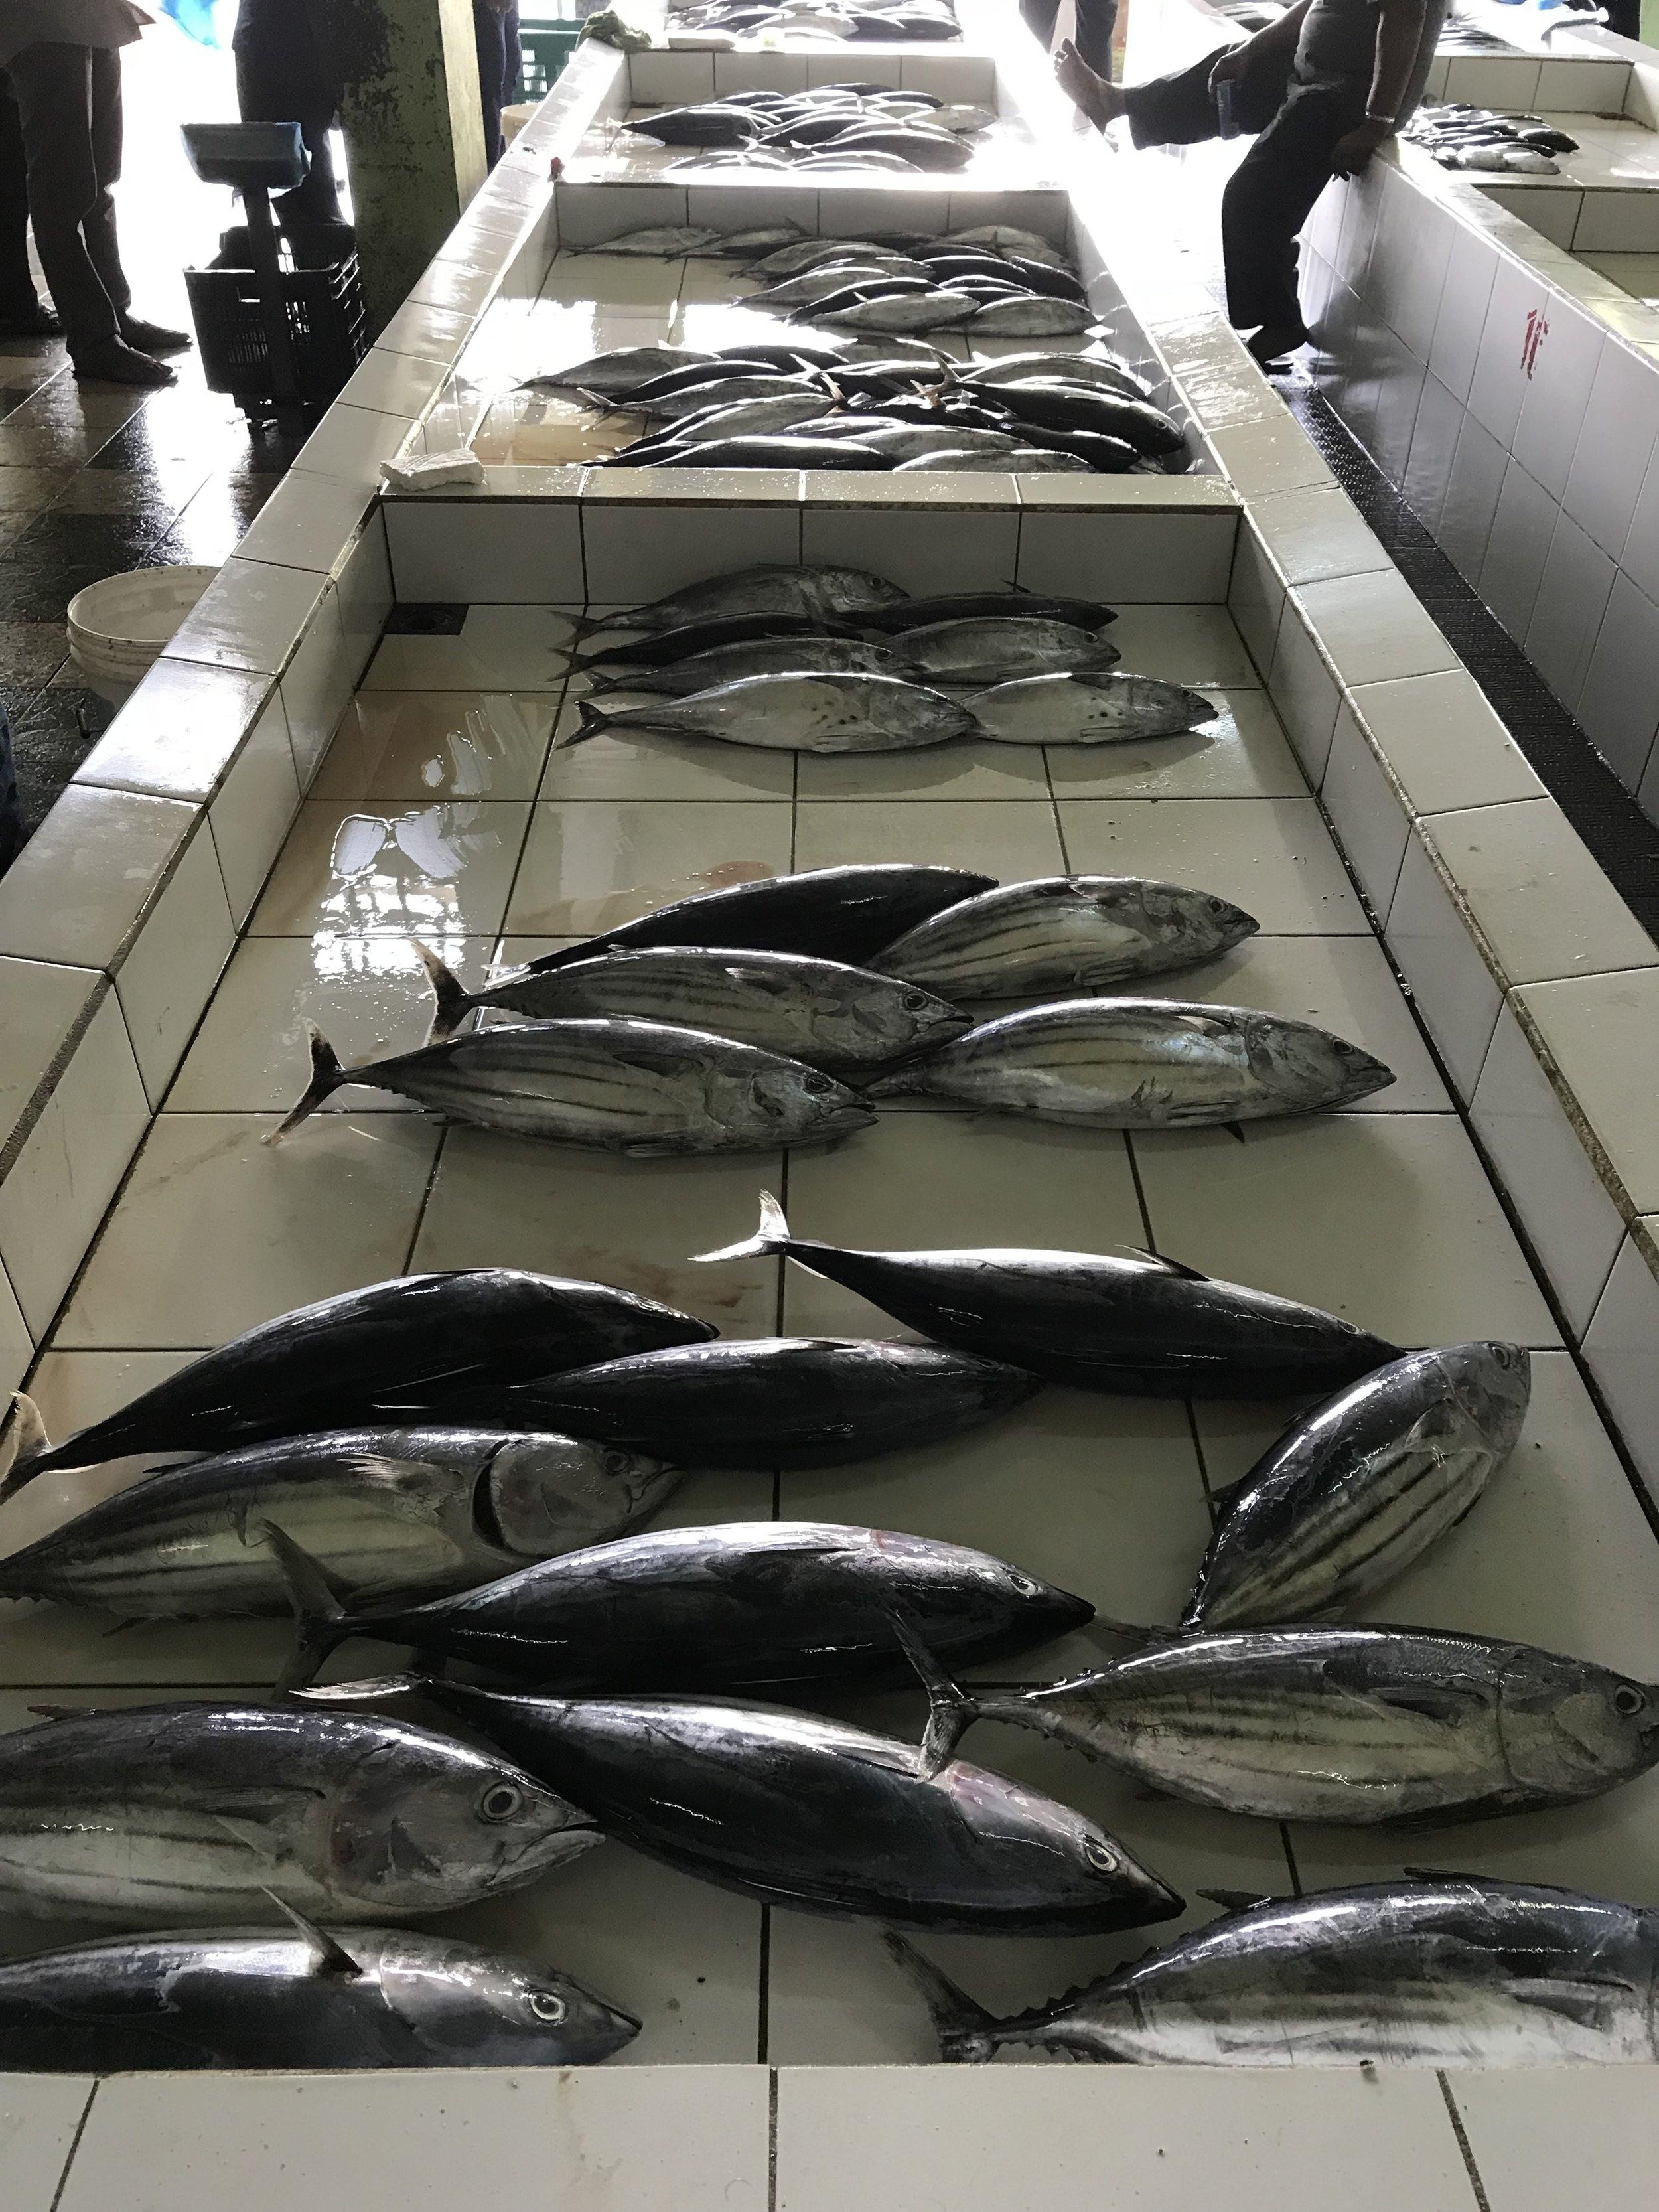 The Local Fish Market